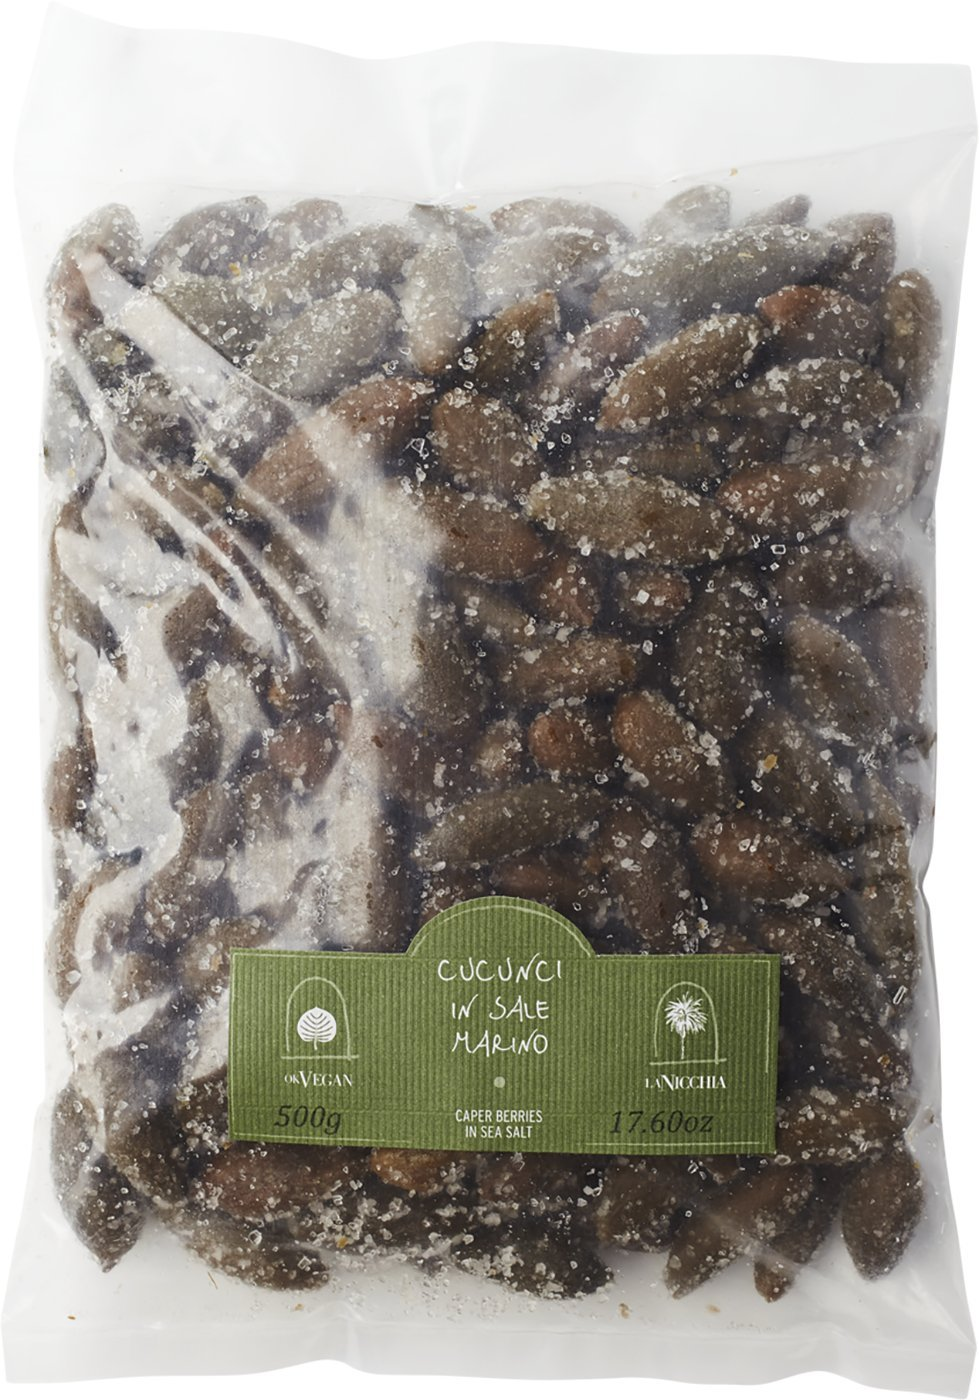 Caperberries Cucunci in Sea Salt - La Nicchia - Pantelleria Island, Sicily - 1.1 lb